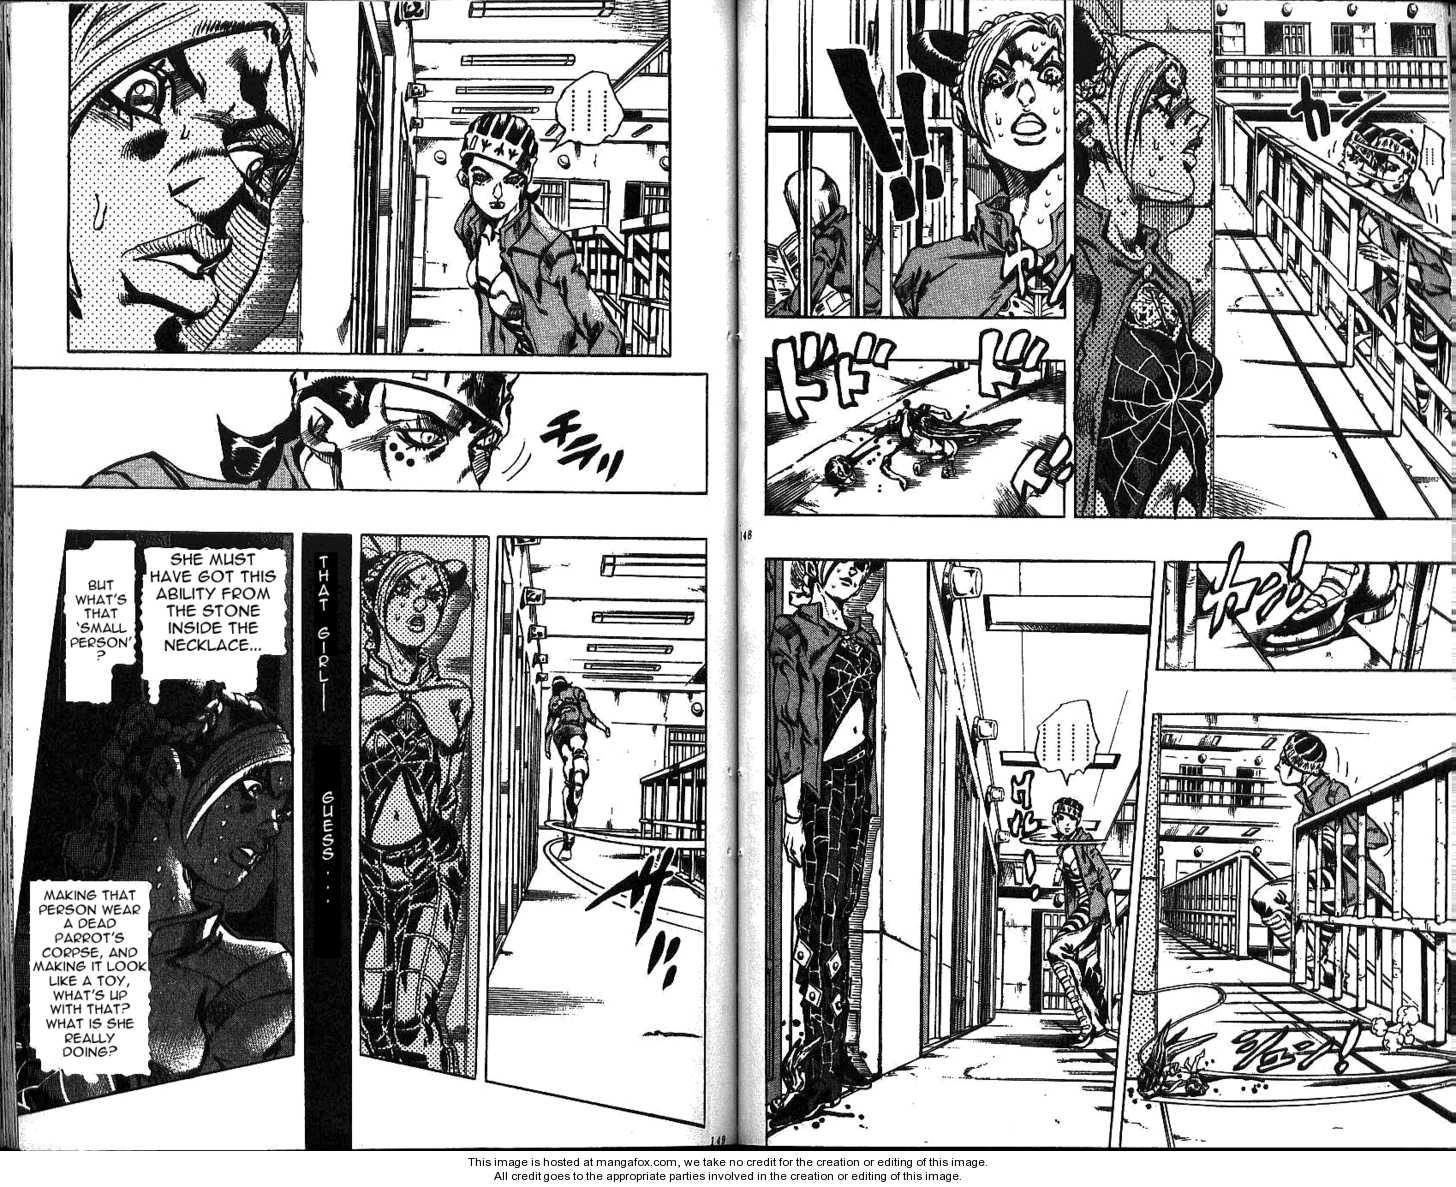 JoJo's Bizarre Adventure 600 Page 3